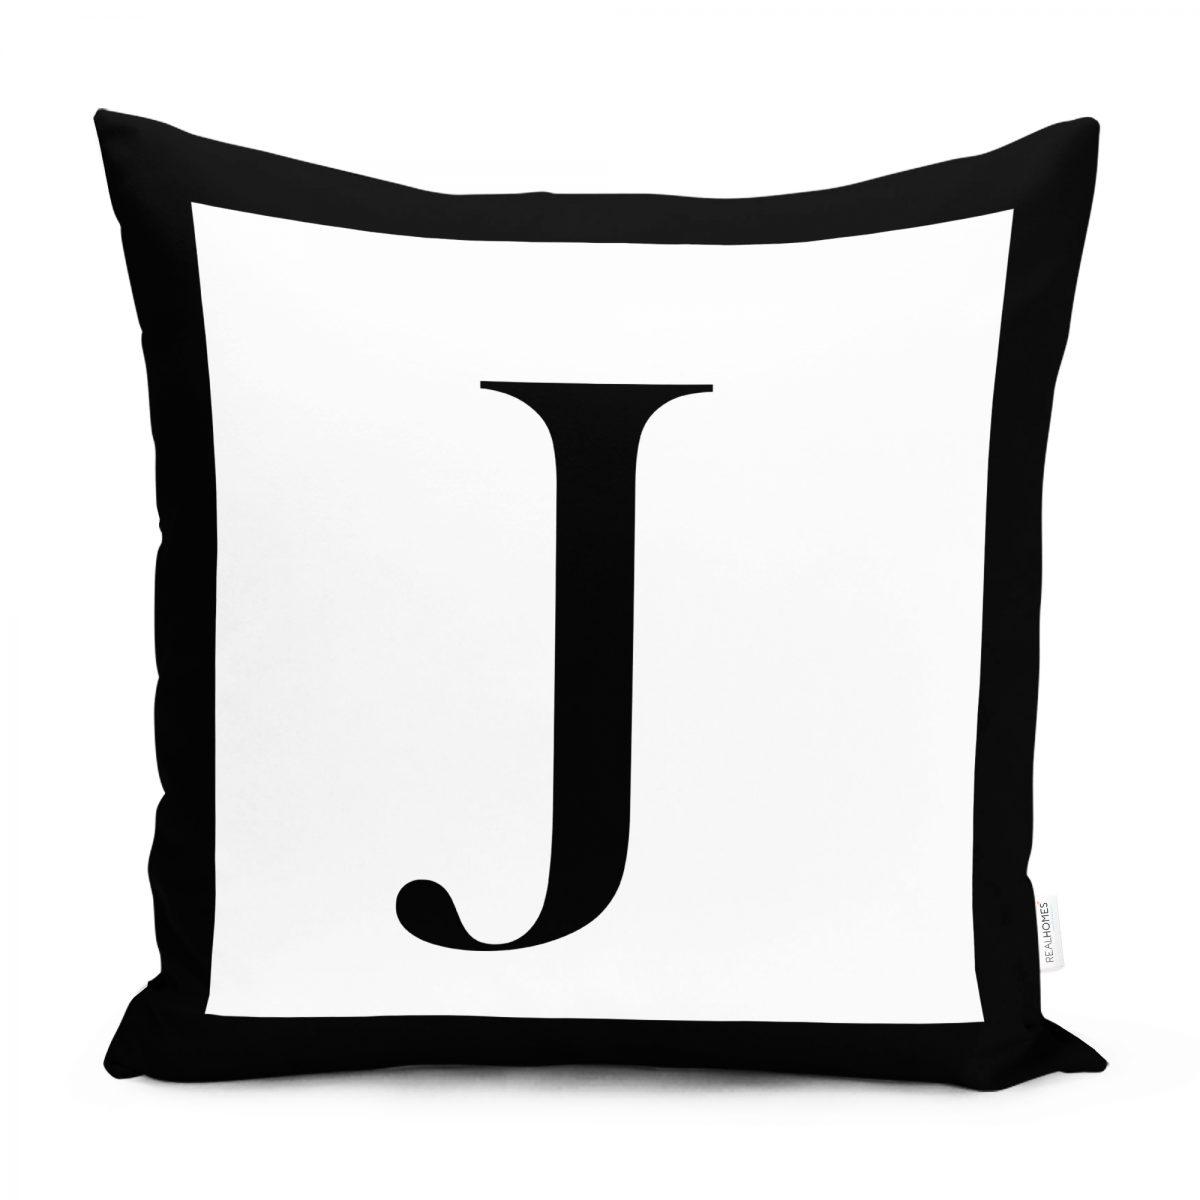 RealHomes Siyah Beyaz J Harfli Yastık Kırlent Kılıfı Realhomes